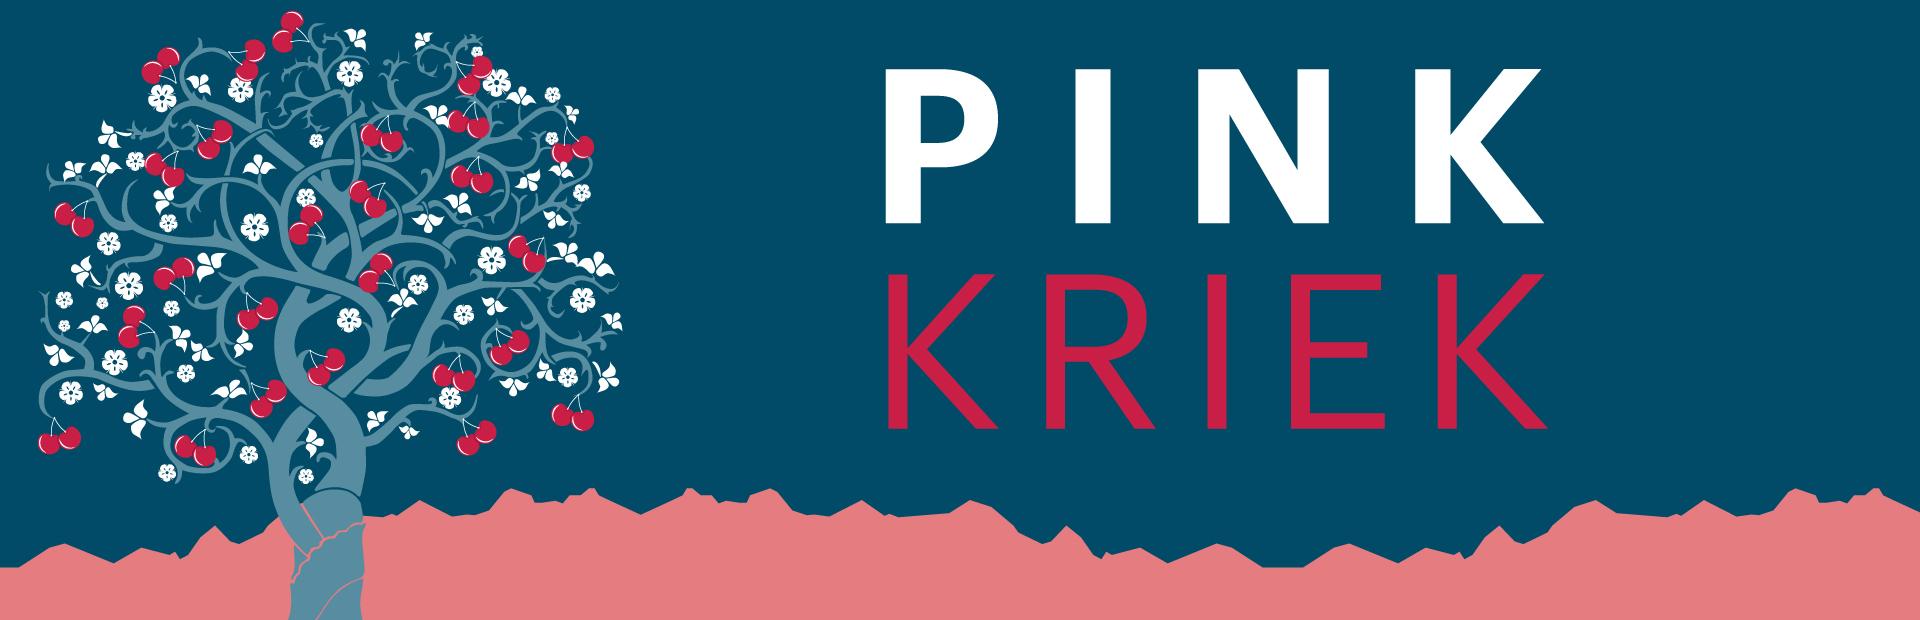 Pink Kriek, etichetta